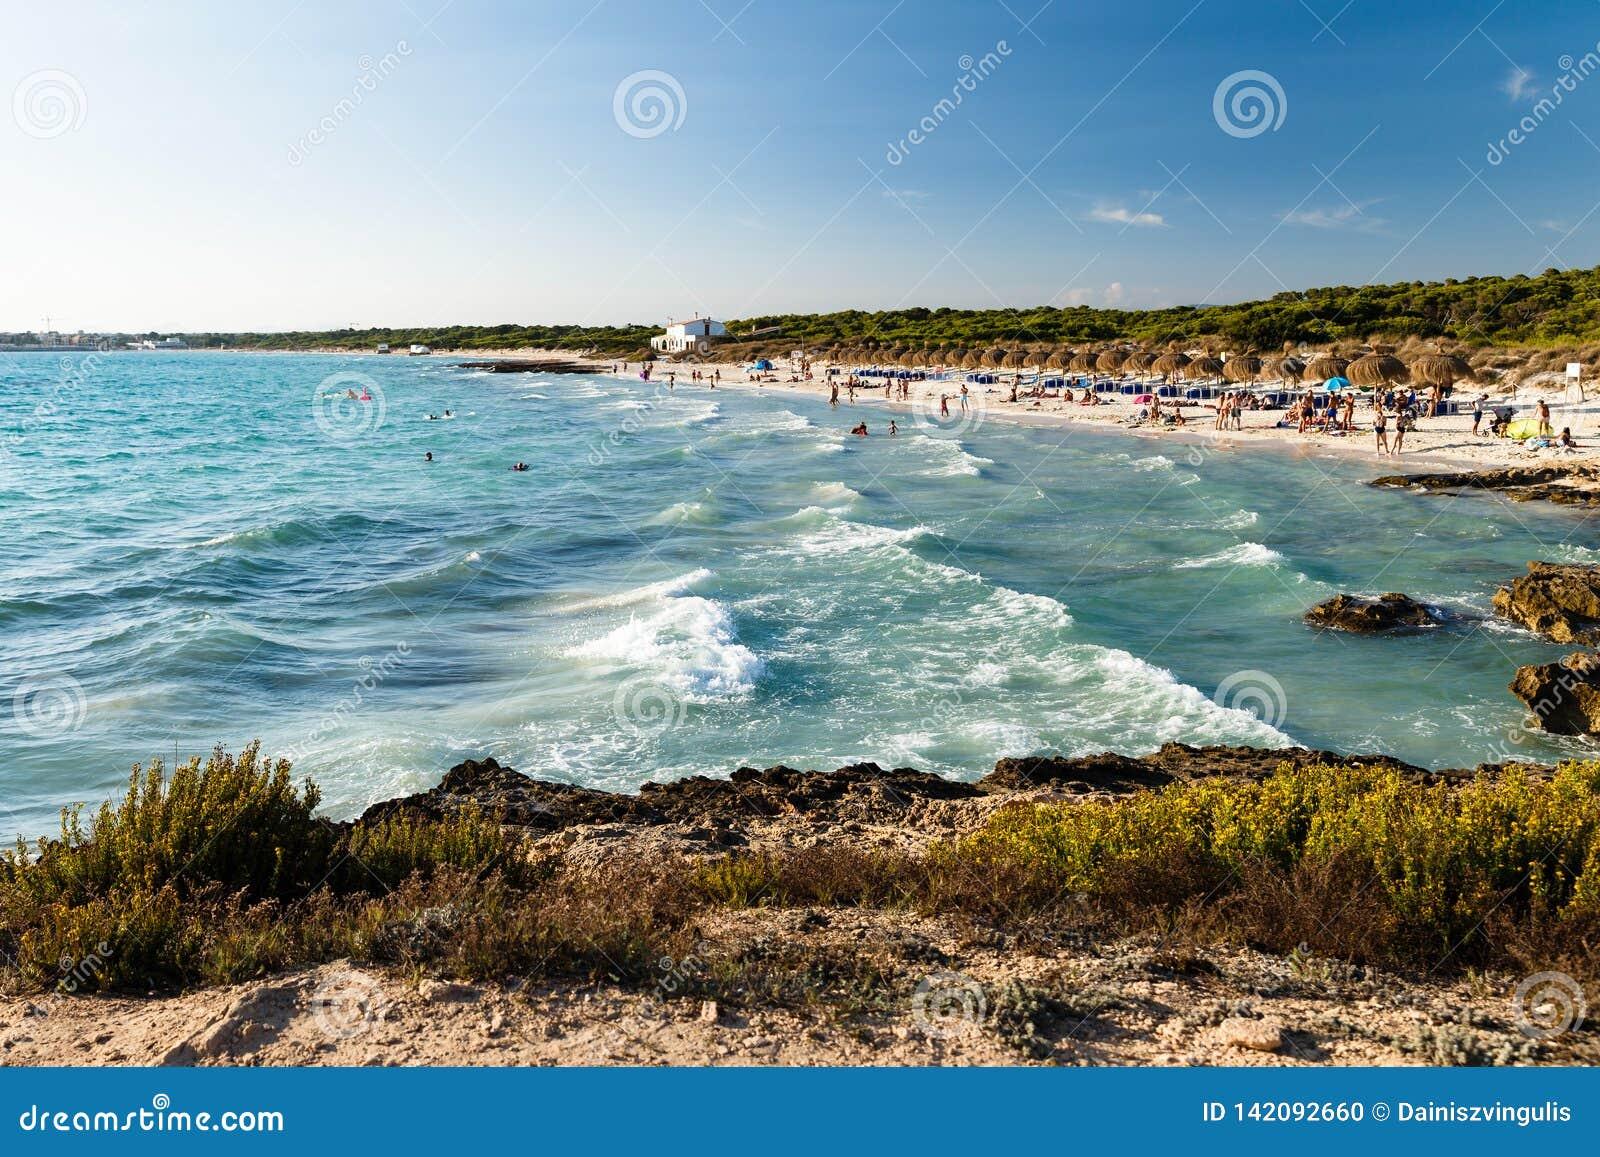 sandy beach with white sand